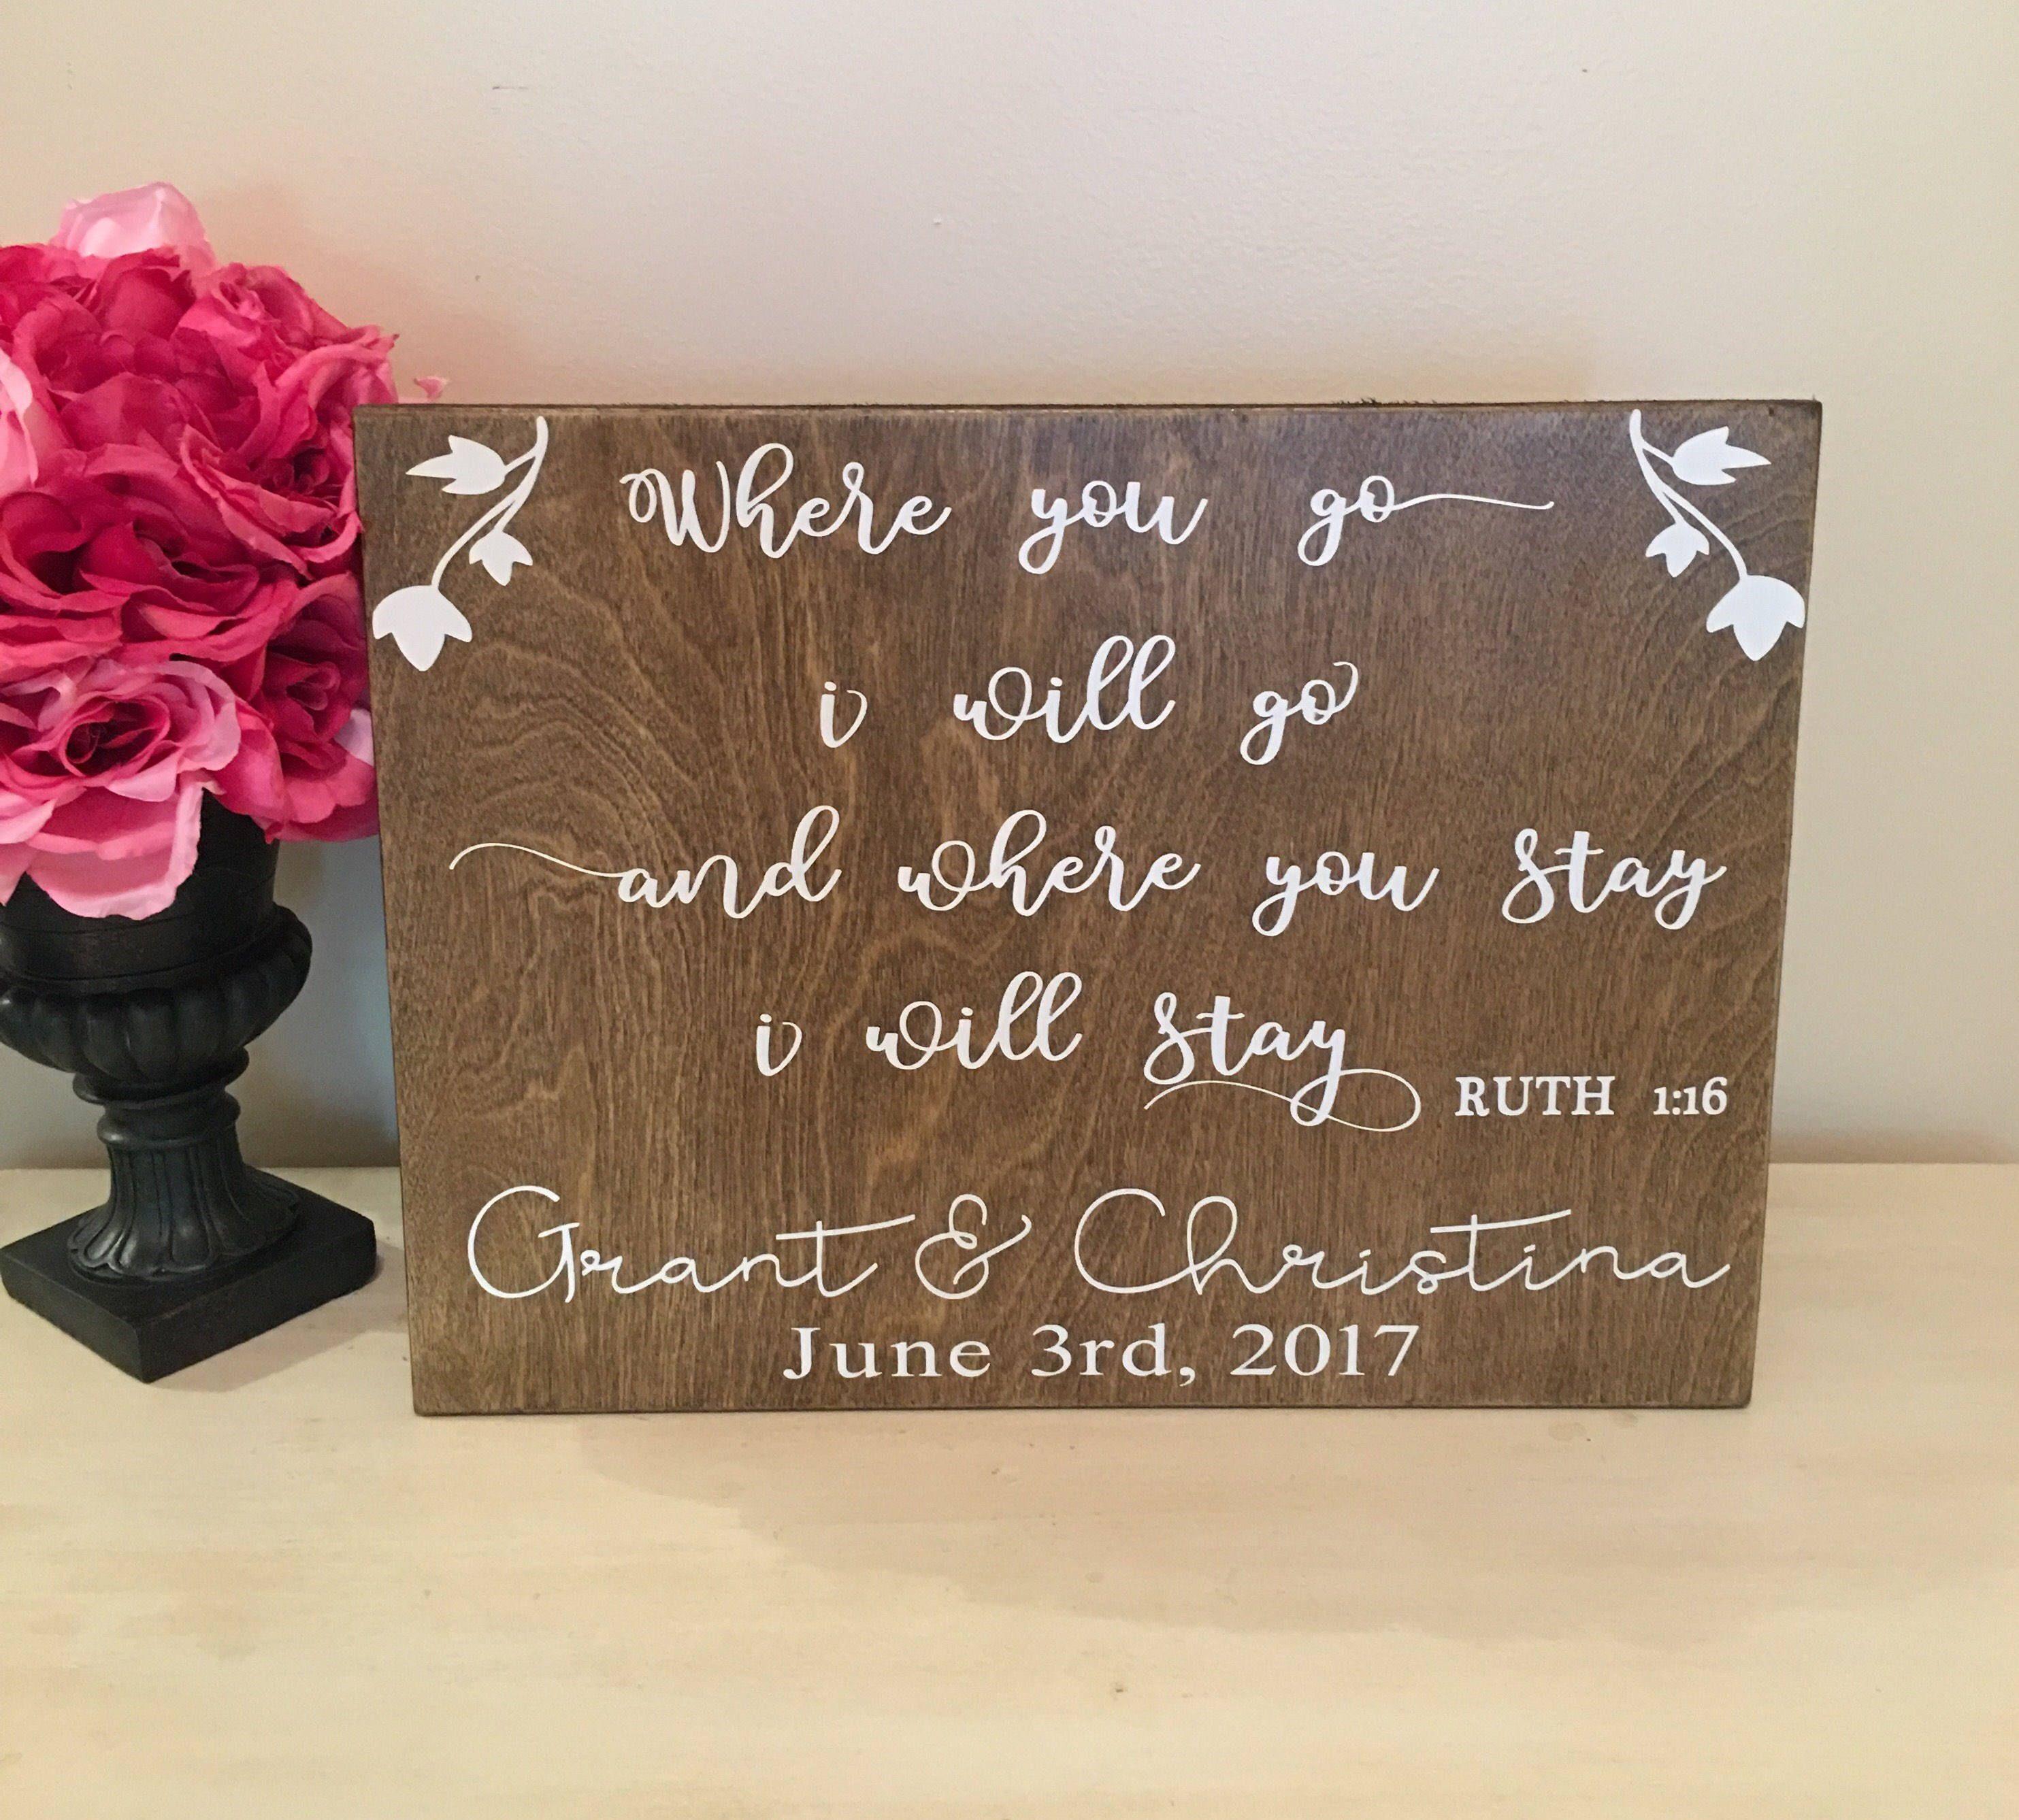 Personalized Wedding Sign Ruth 1 16Christian WeddingEngagement GiftReligious